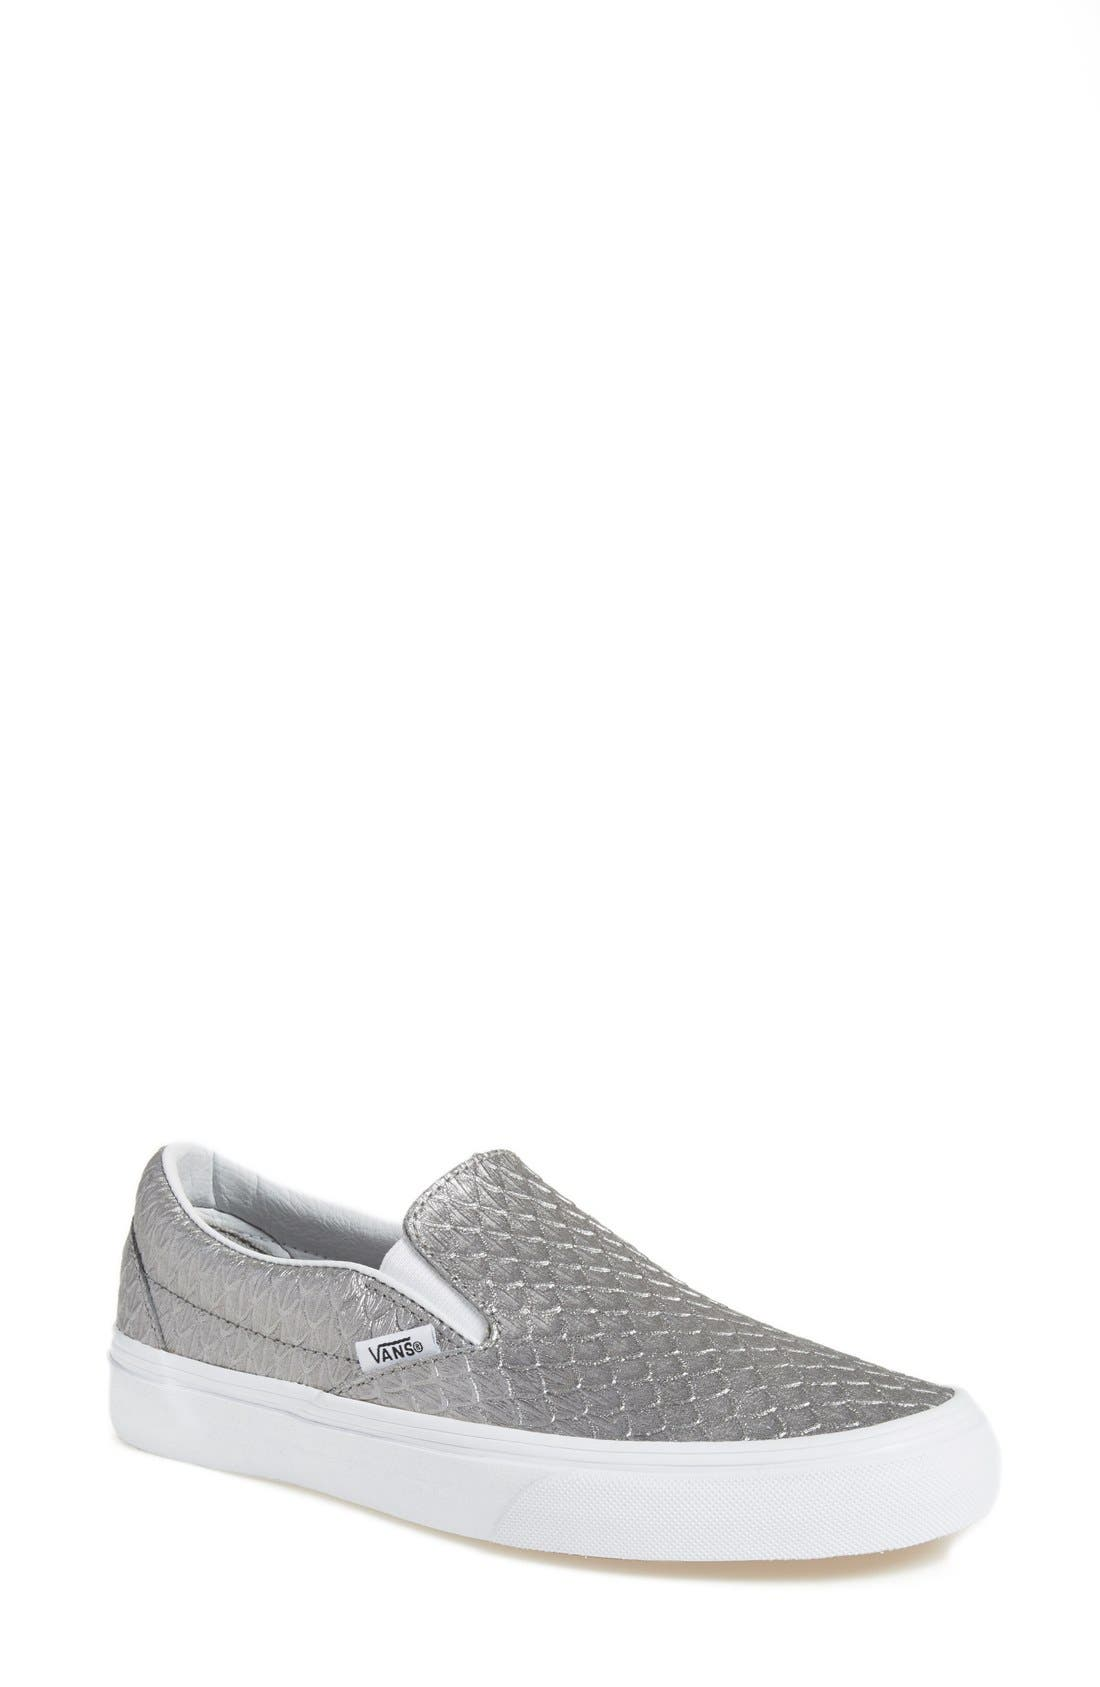 ,                             Classic Slip-On Sneaker,                             Main thumbnail 286, color,                             040